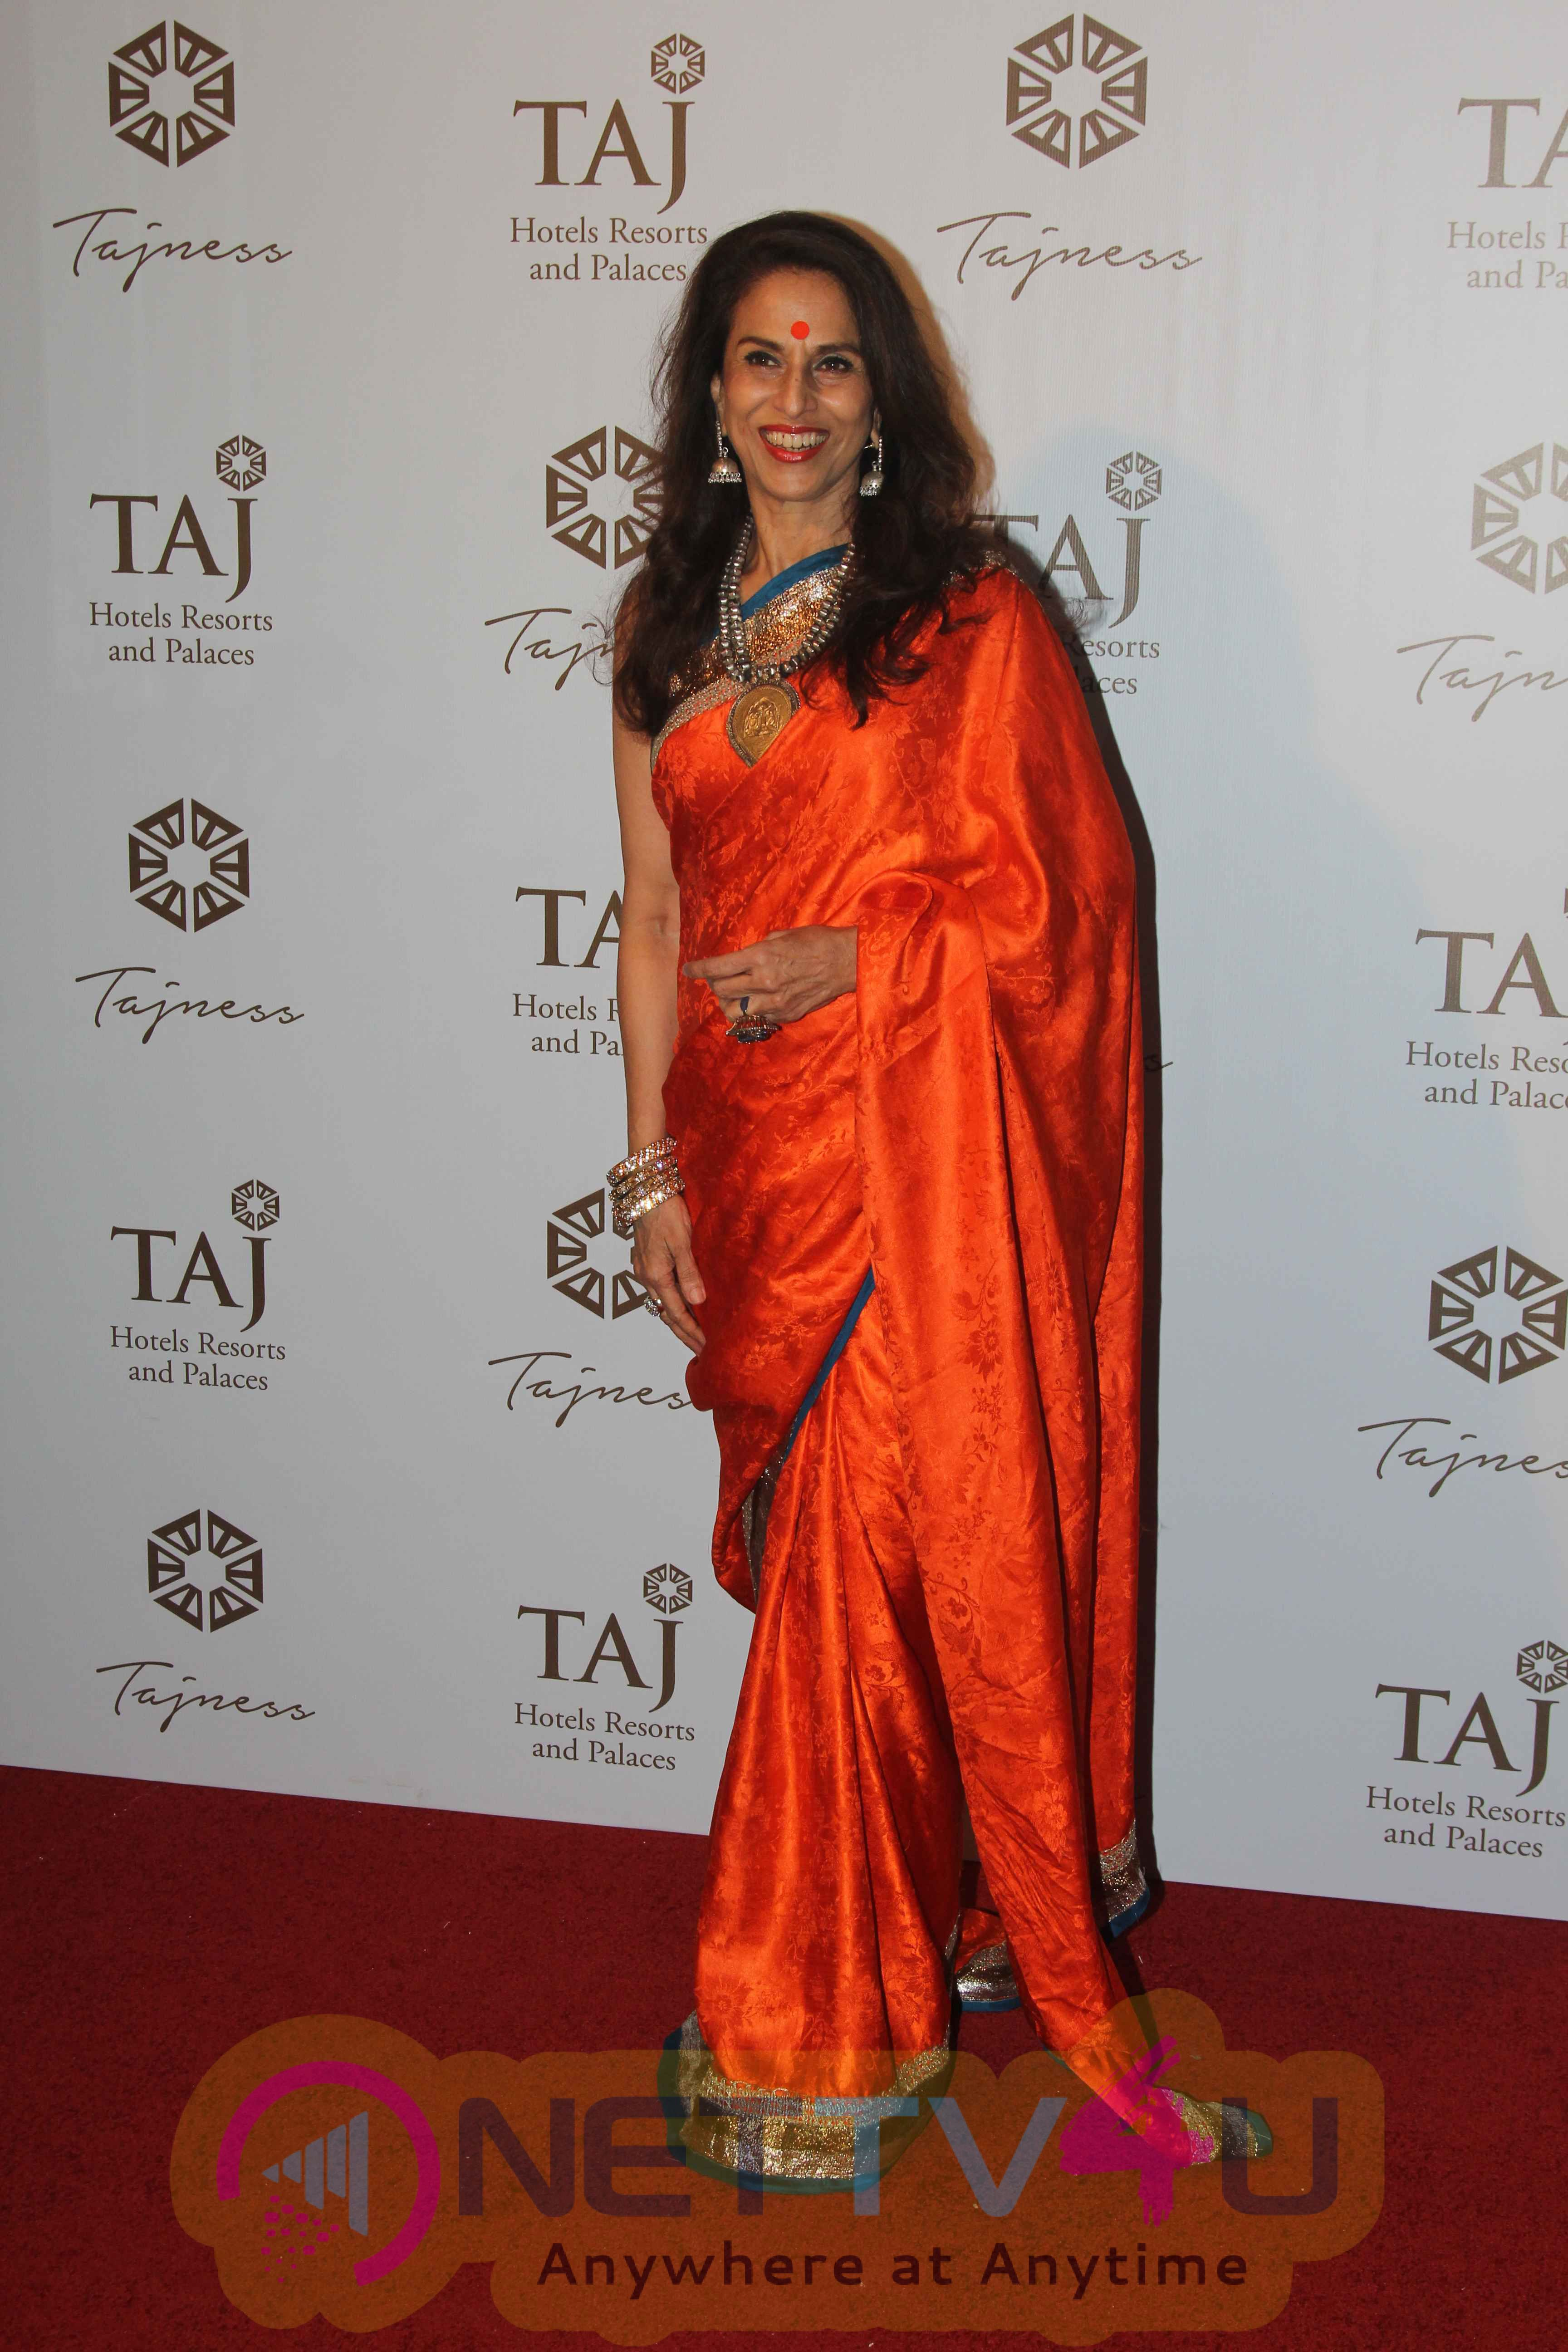 Ratan Tata Event At Taj Hotel Event Photos